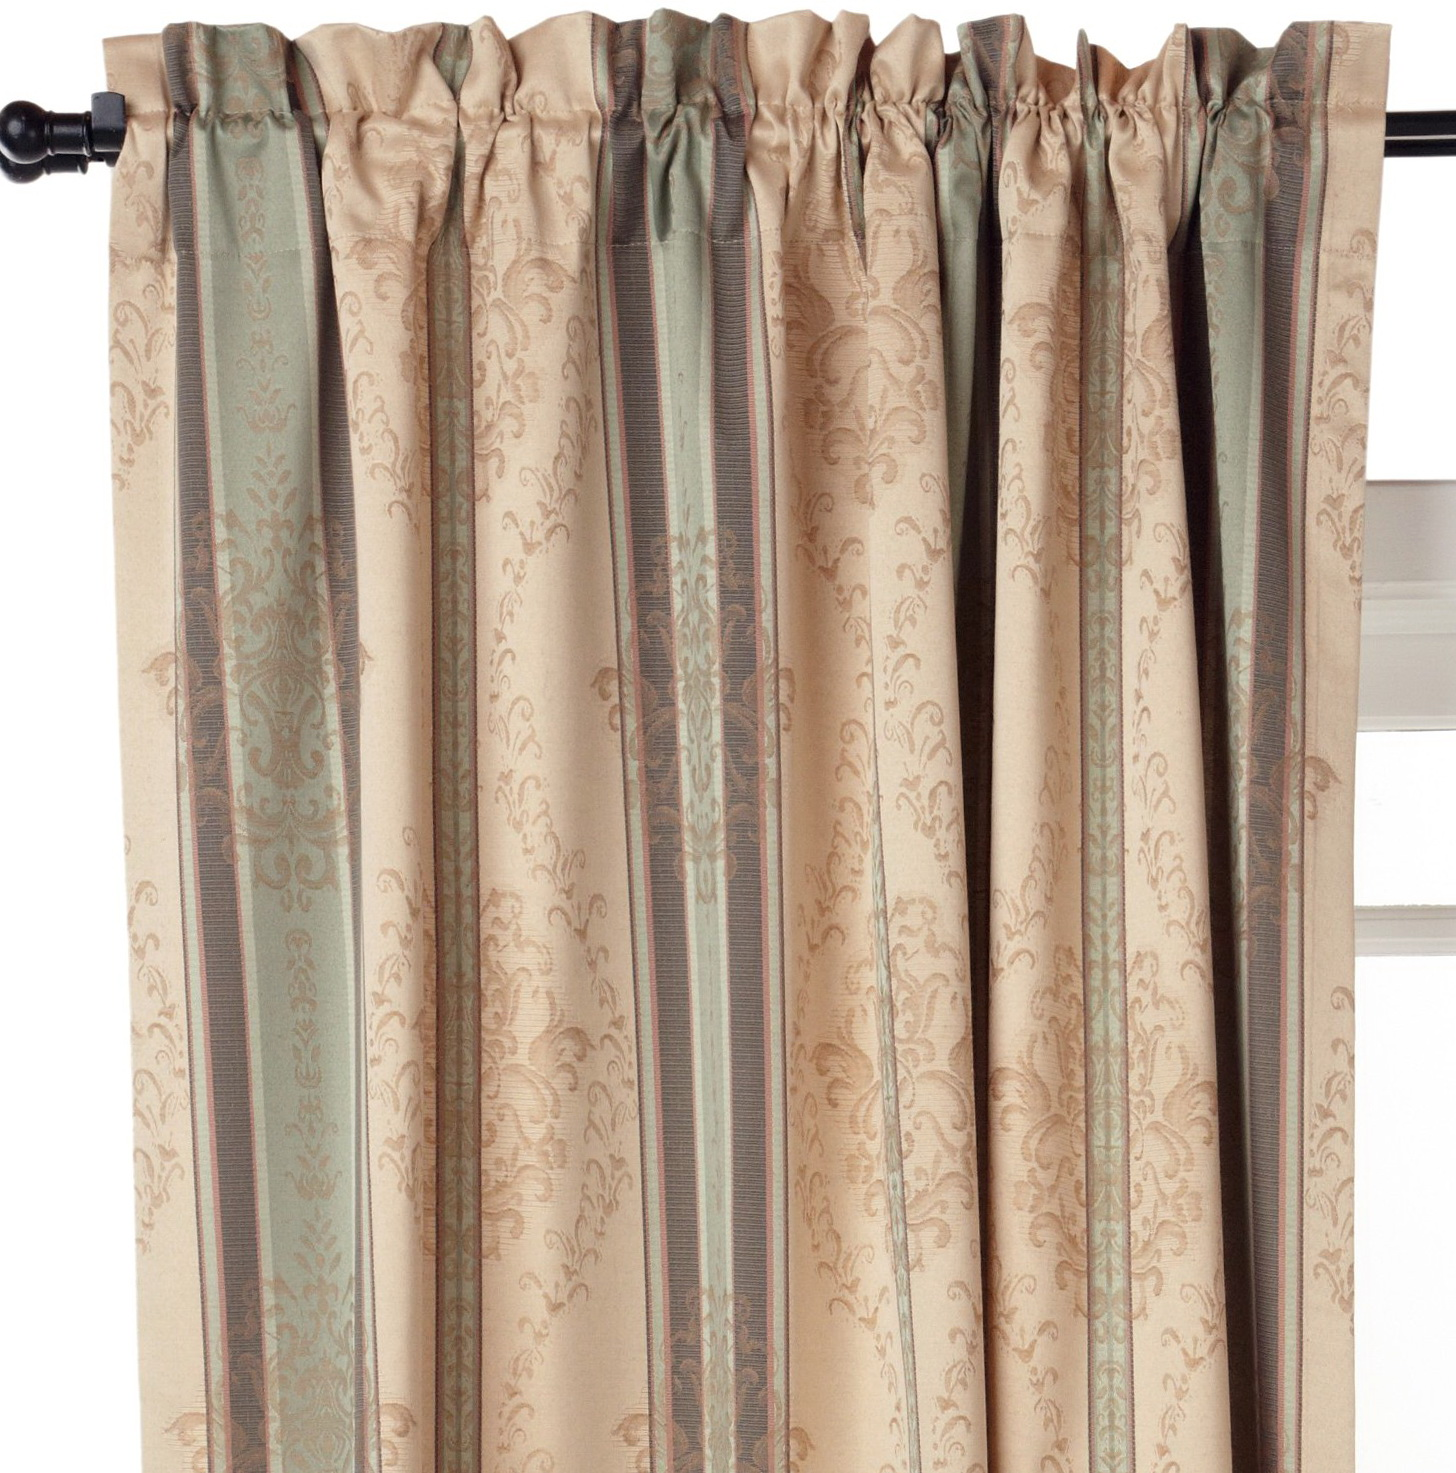 Sound Blocking Curtains Amazon Home Design Ideas